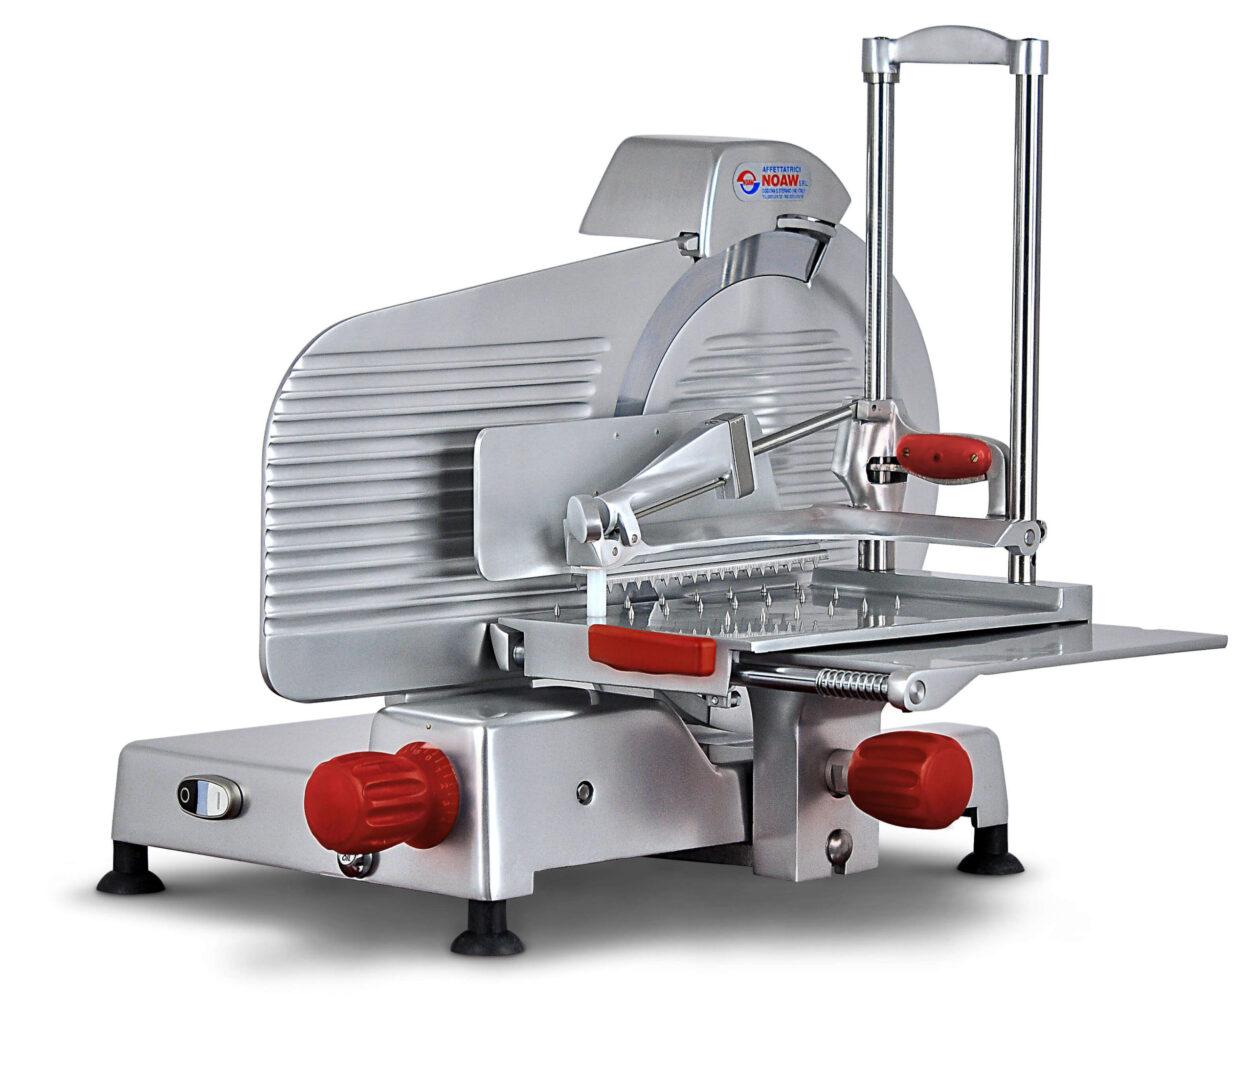 NOAW Manual Vertical Slicer